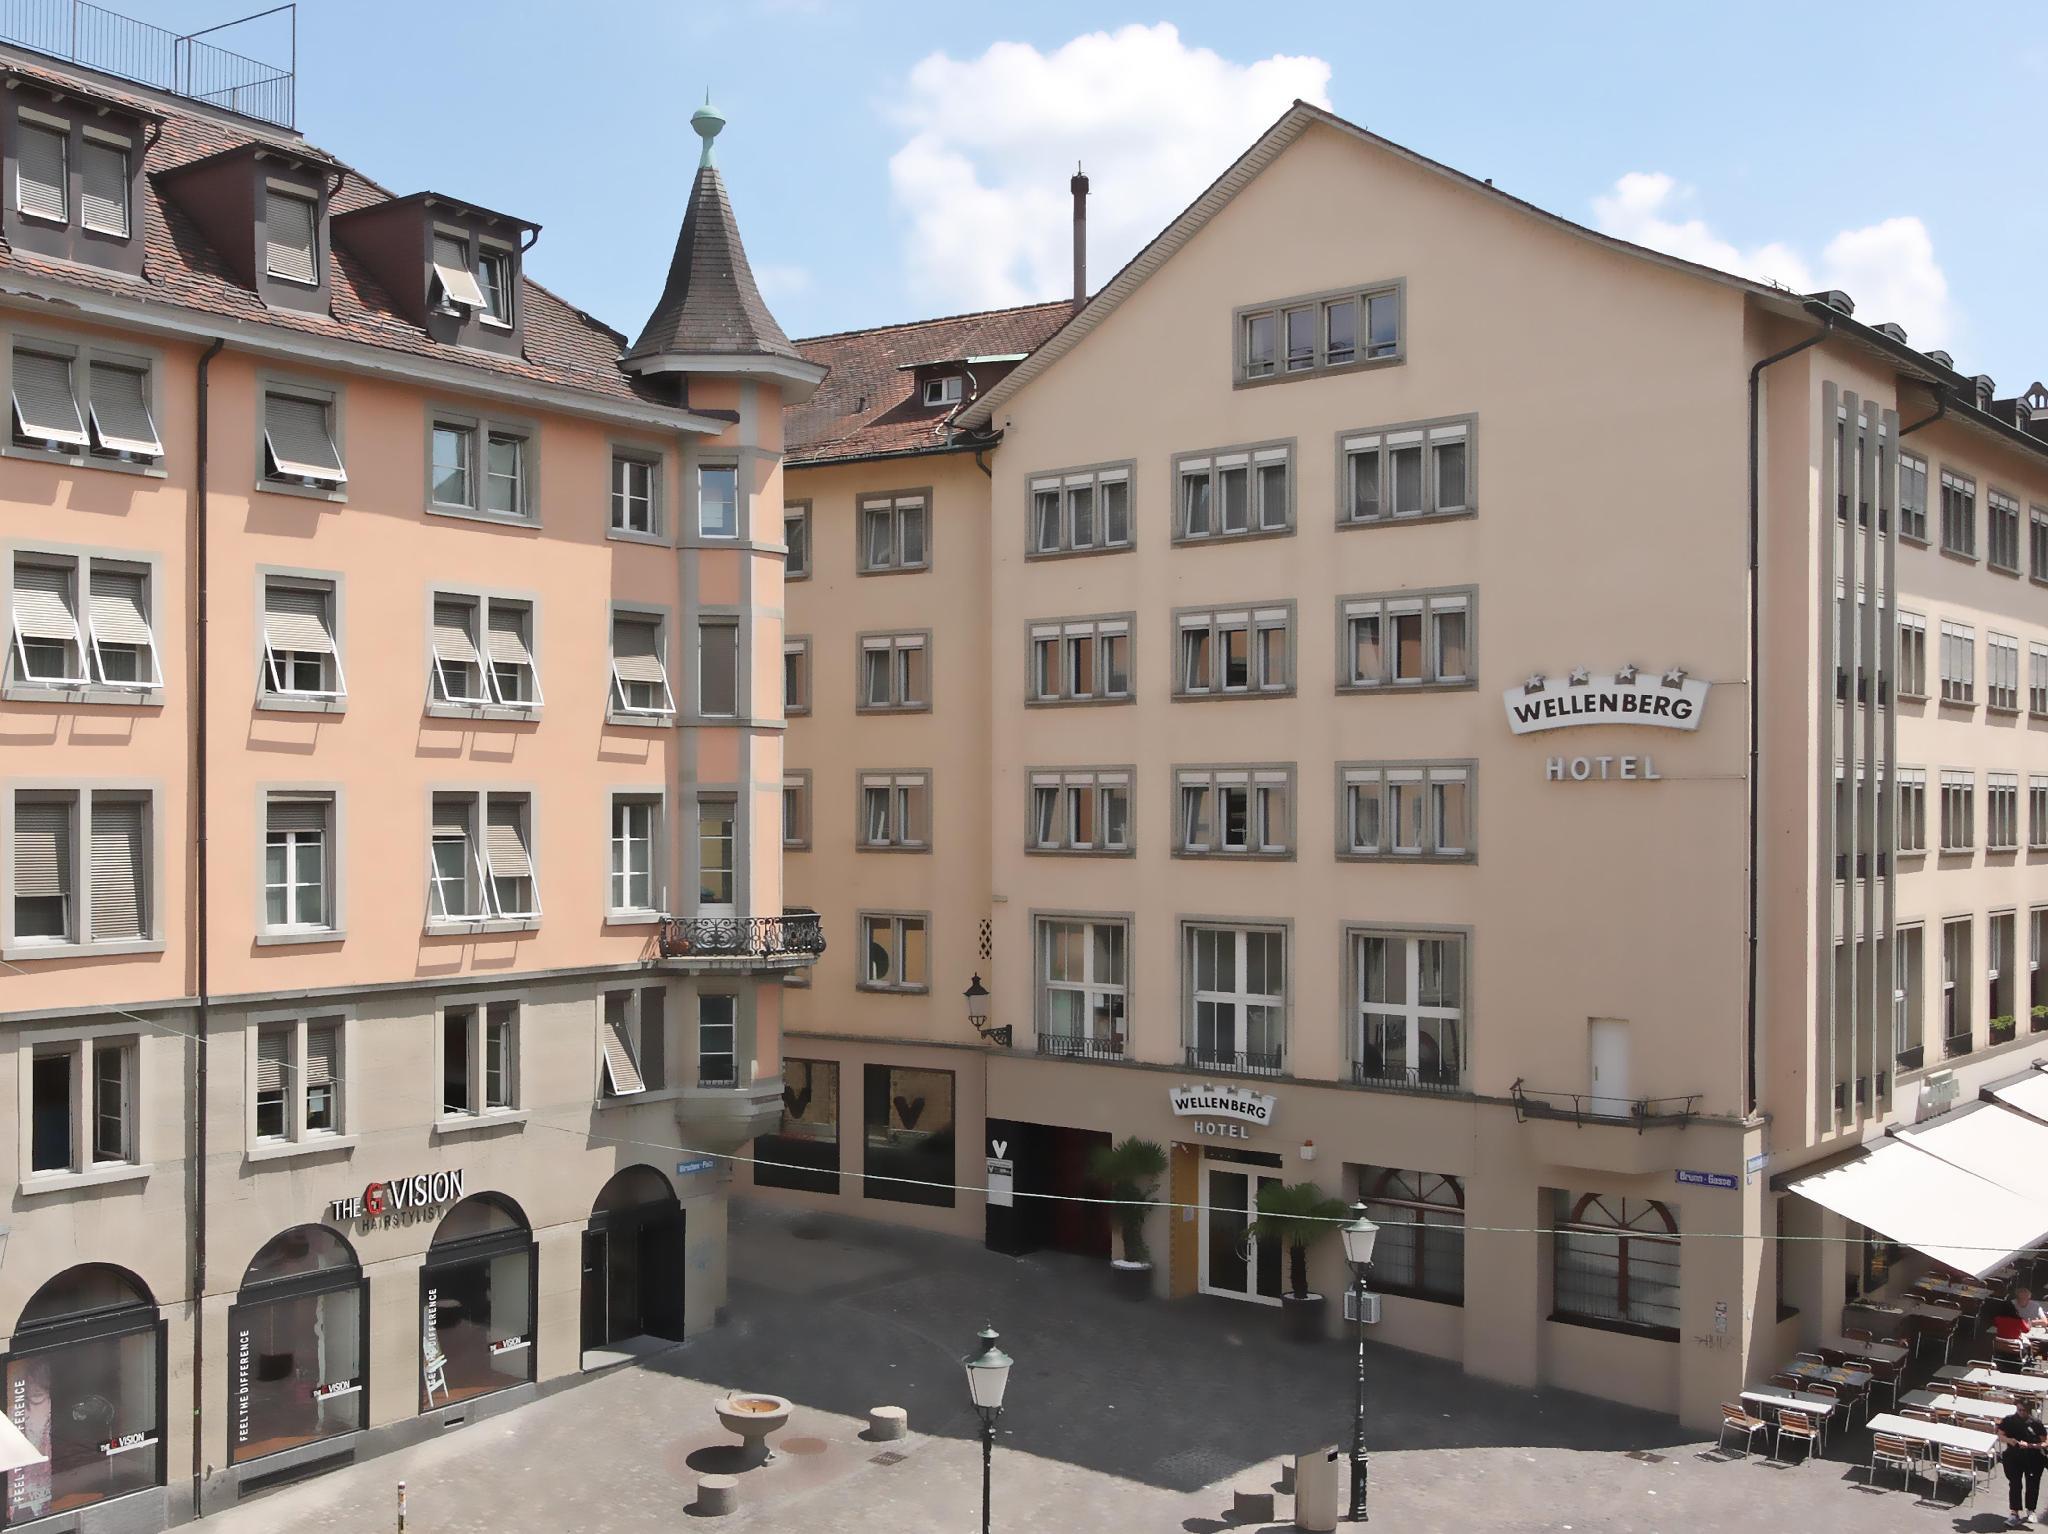 Boutique Hotel Wellenberg